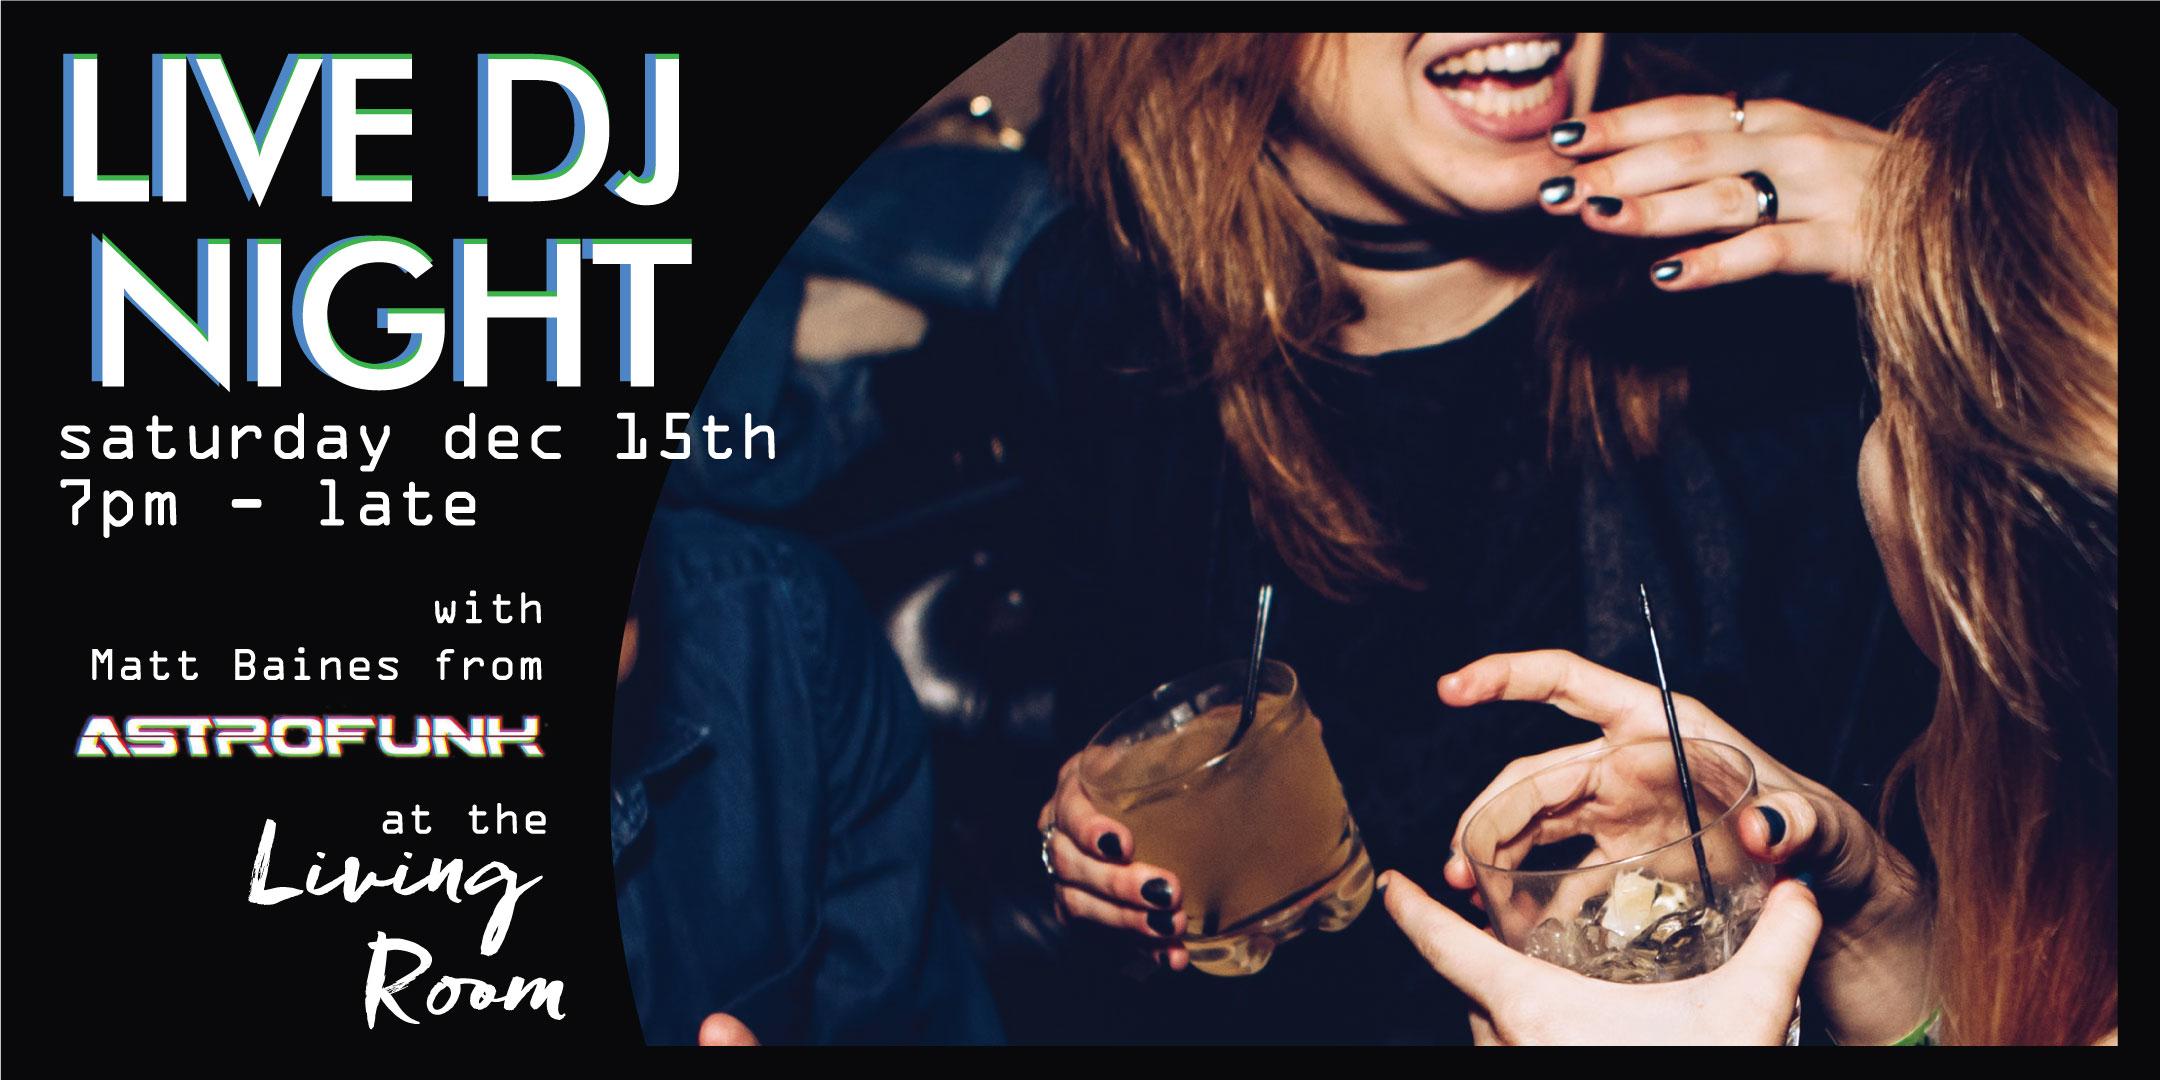 Live DJ night at room2